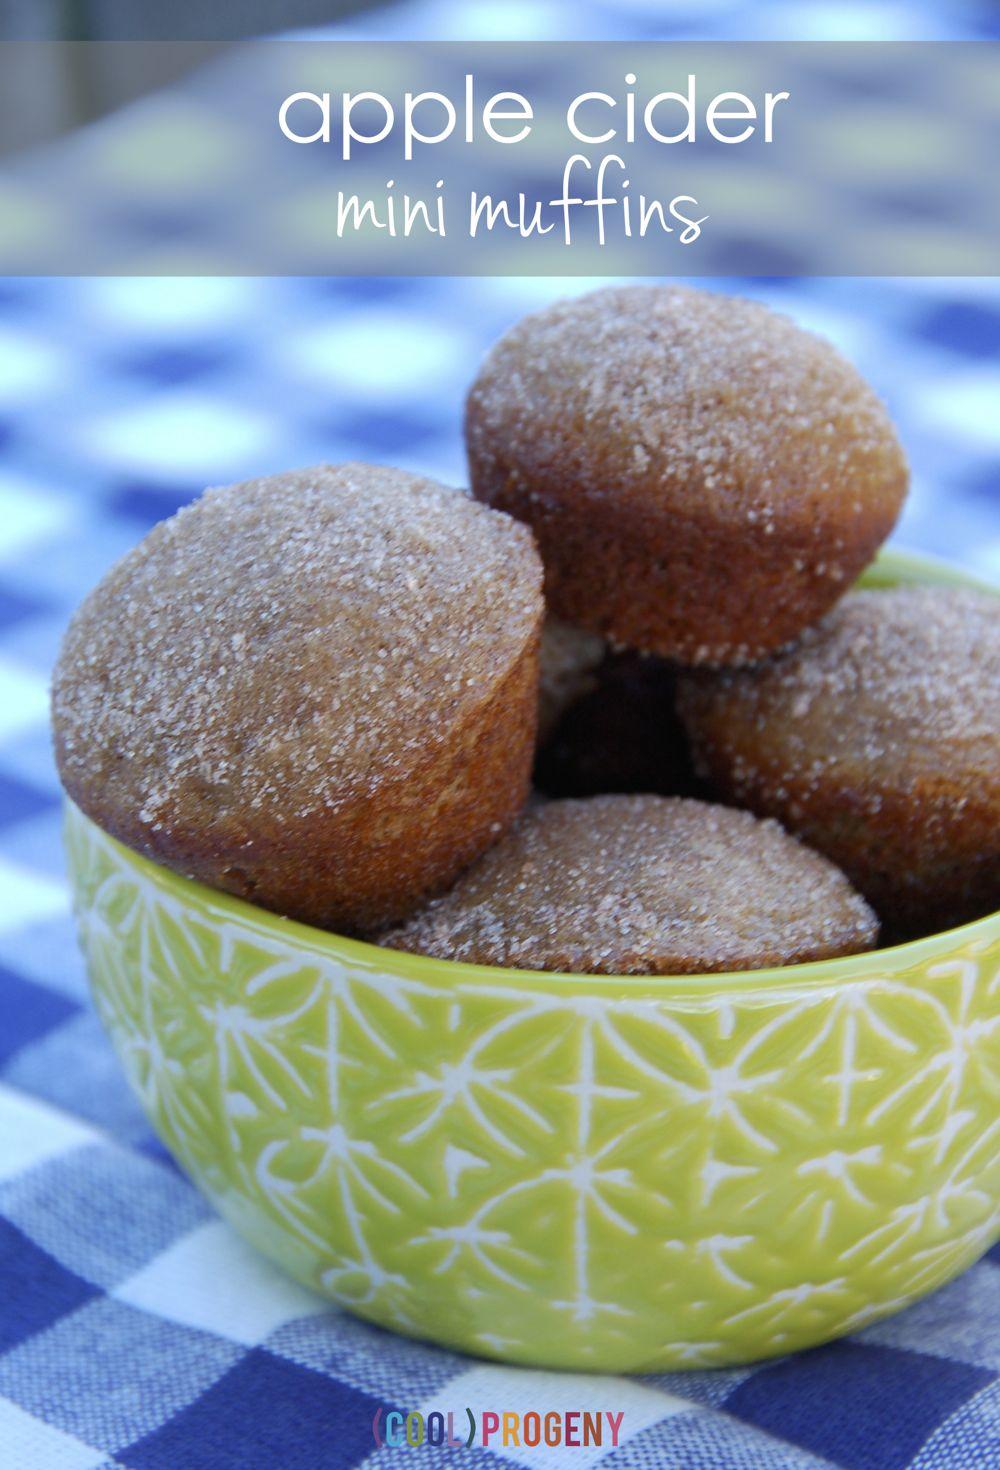 Apple Cider Mini Muffins - (cool) progeny